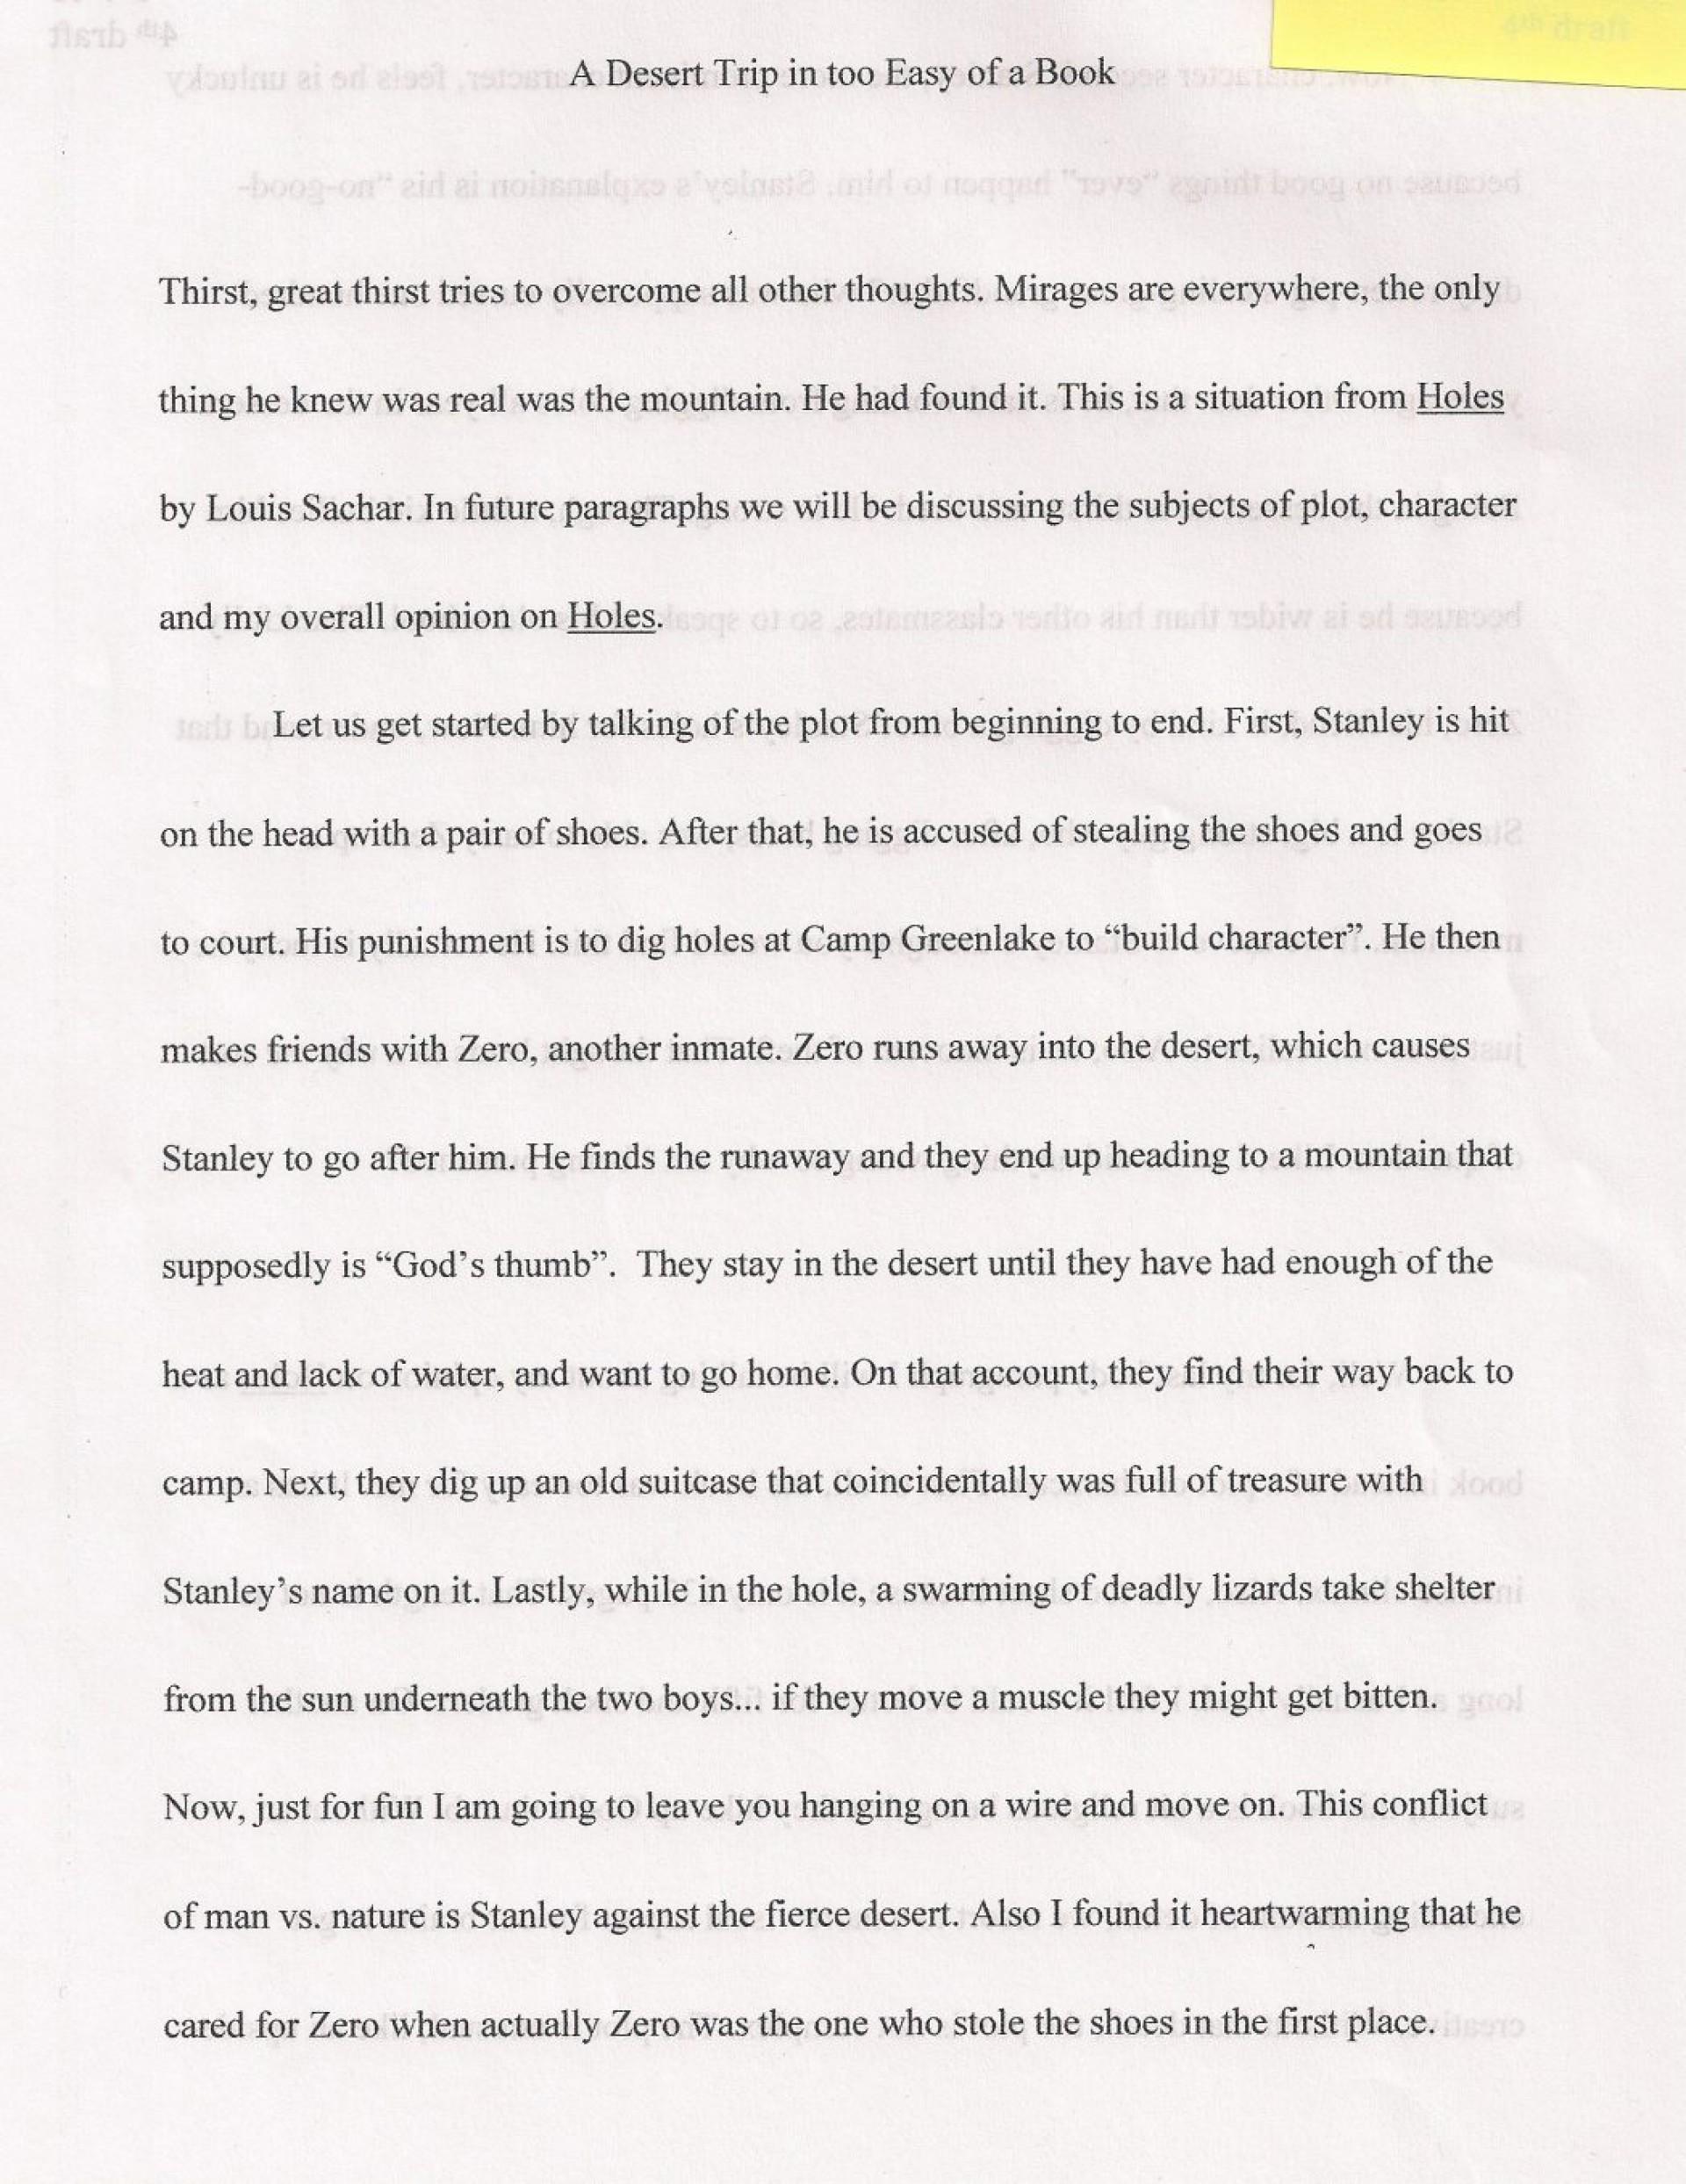 028 Good Essay Hooks For Argument Essays Argumentative Colleges Desert Best 1048x1358 Rare Quotes Narrative About Love 1920